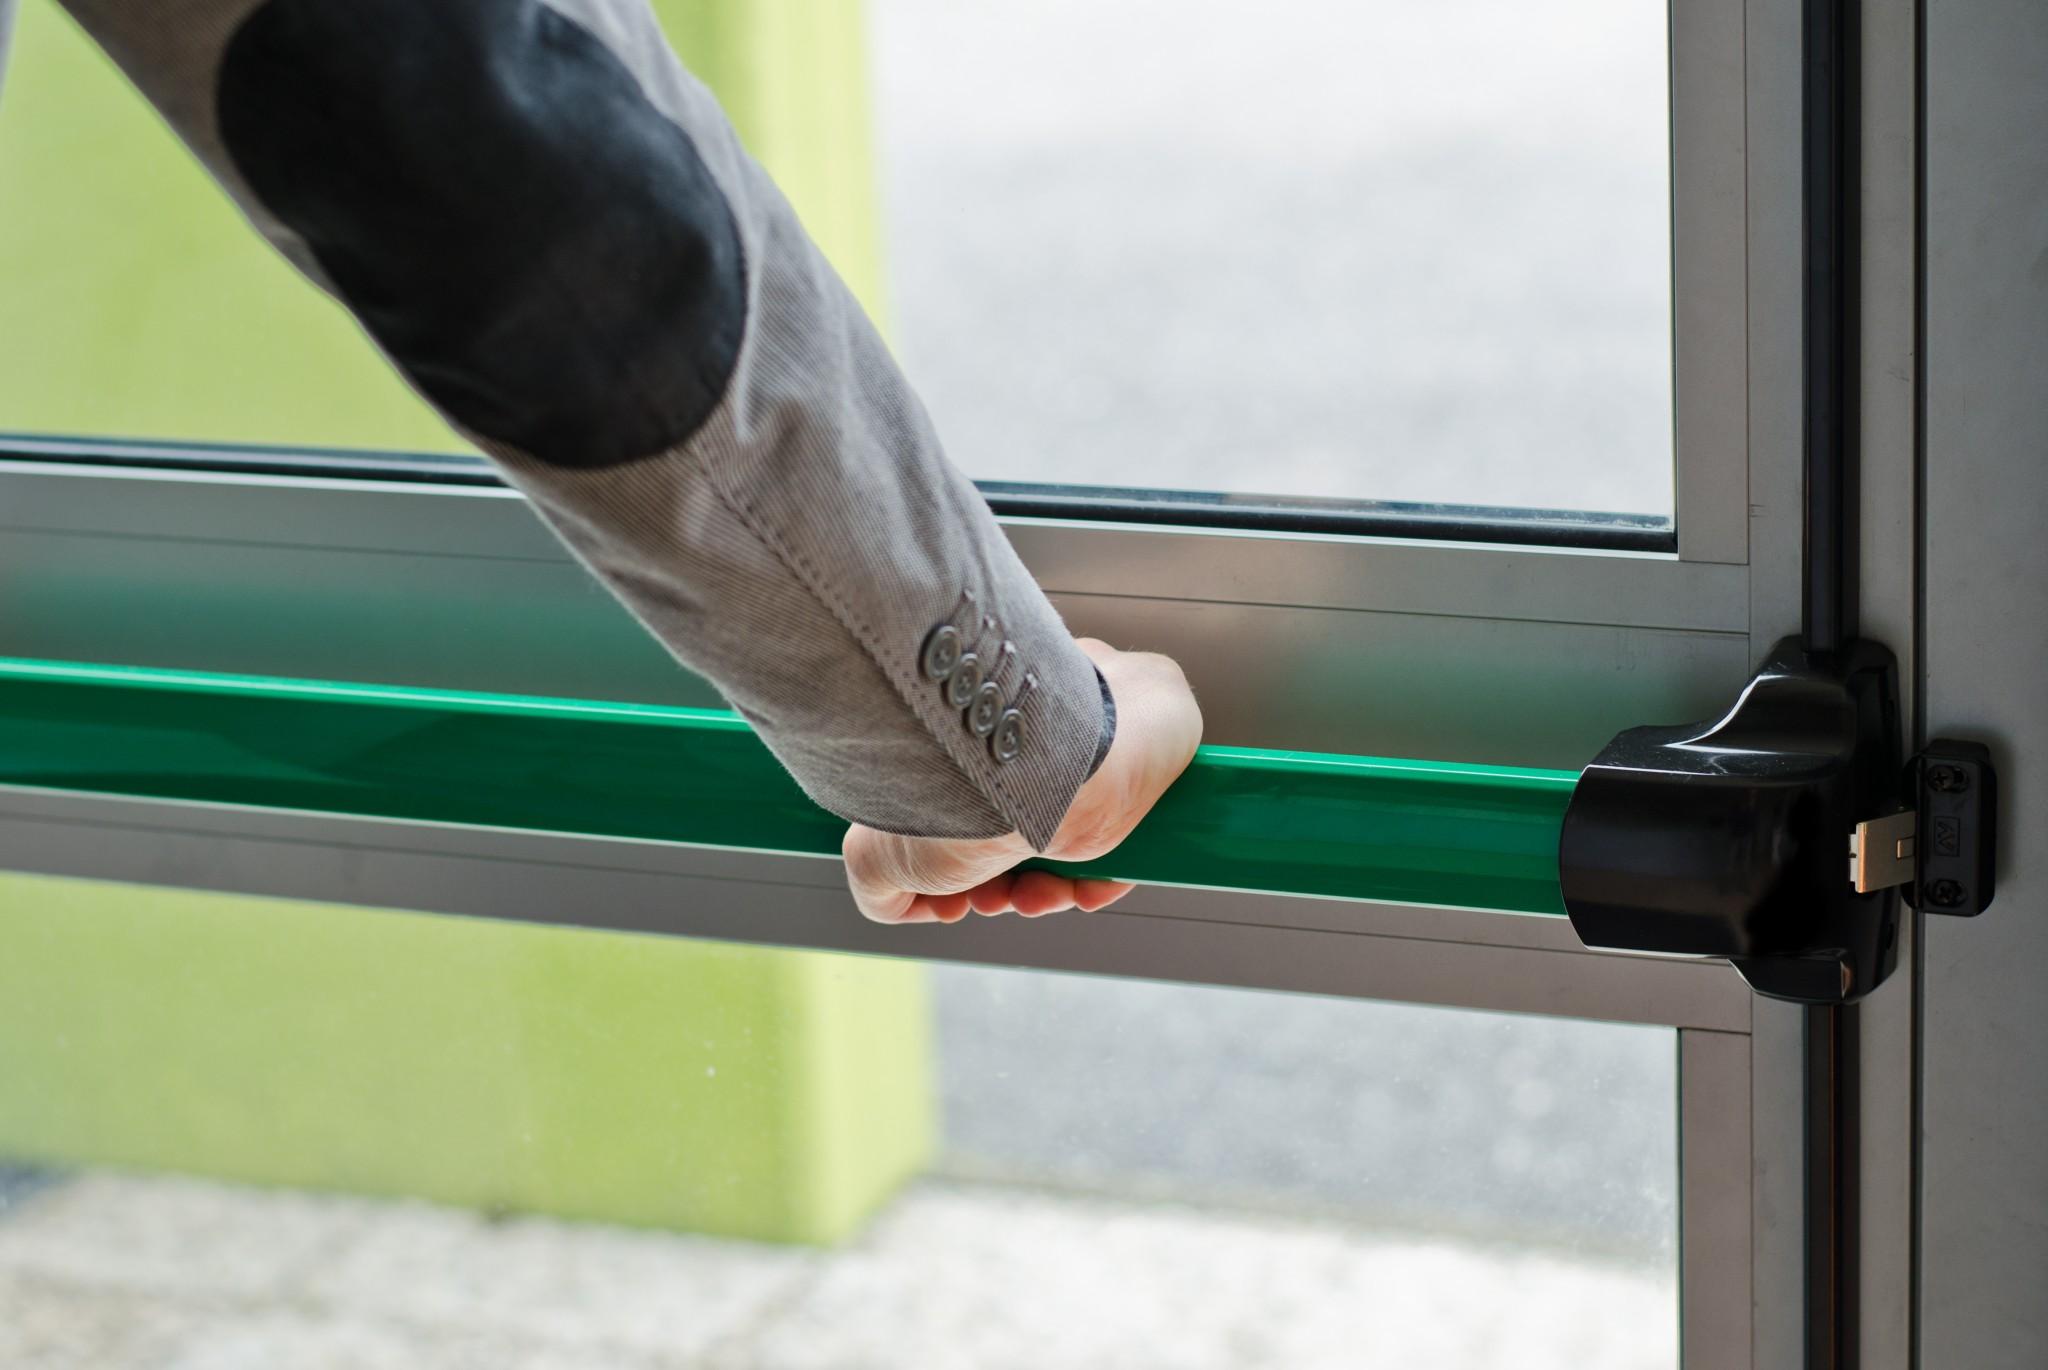 bigstock-Hand-Pressing-Panic-Push-Bar-T-52347697